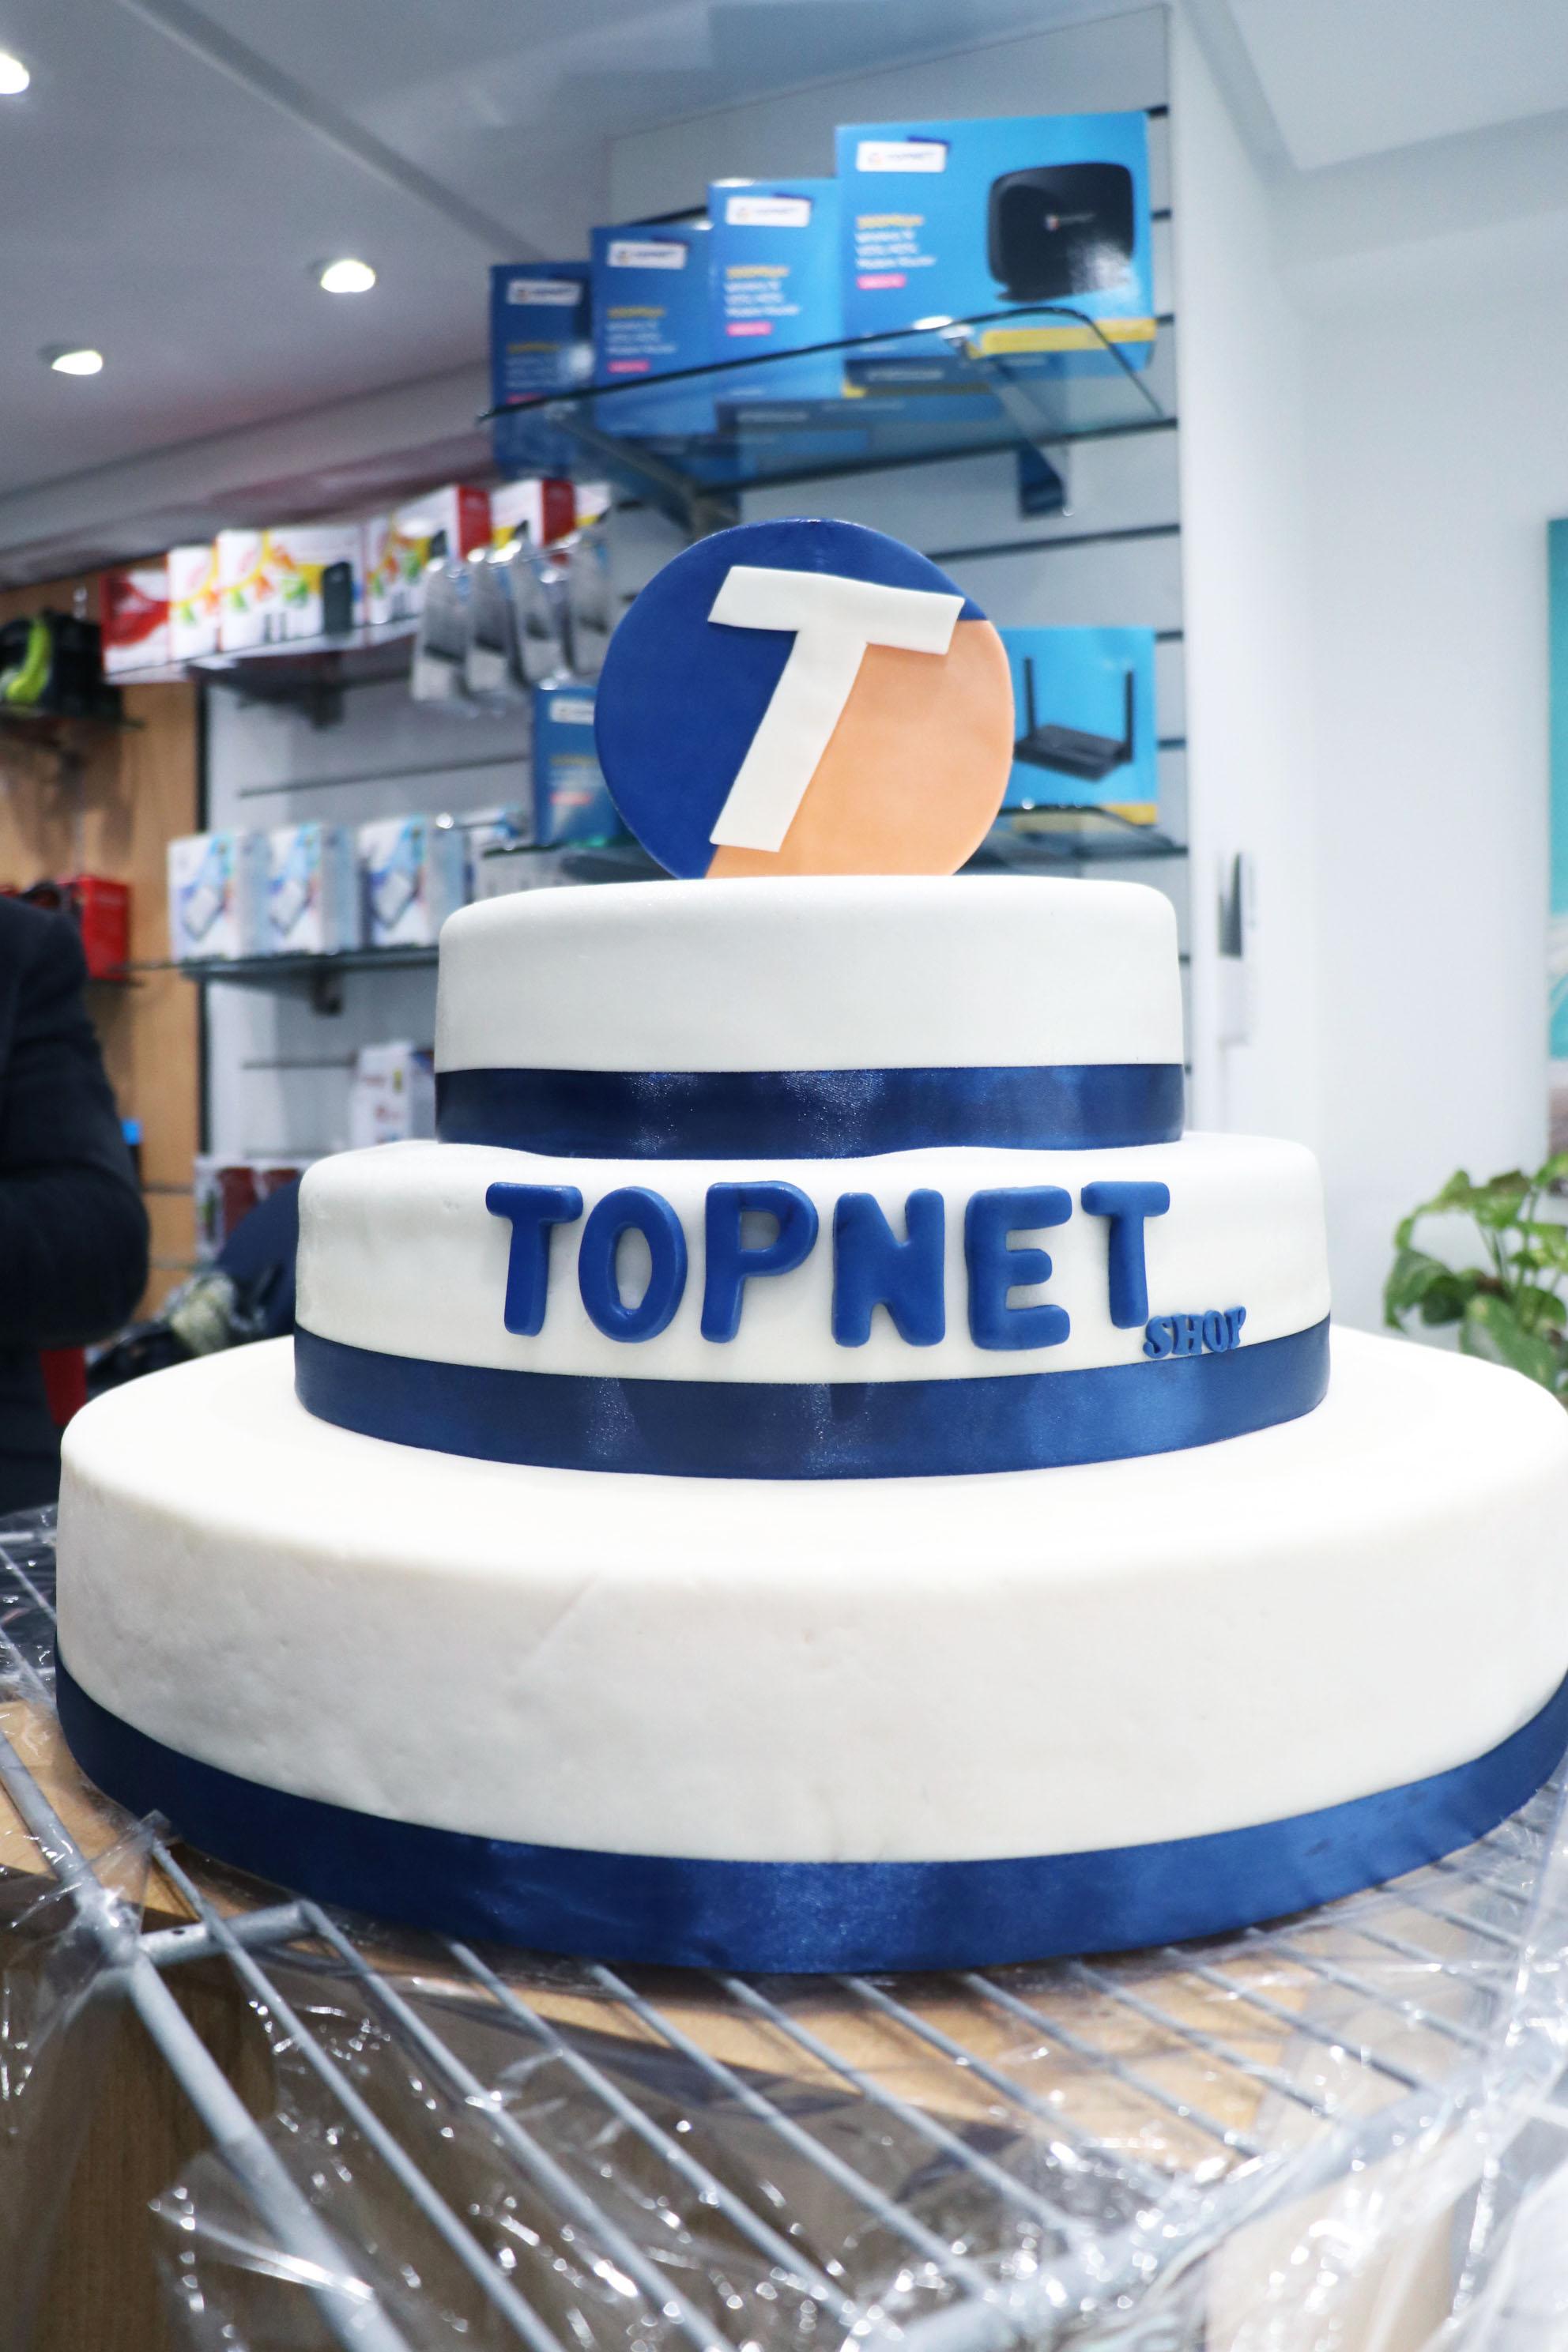 topnet-kef-54.jpg